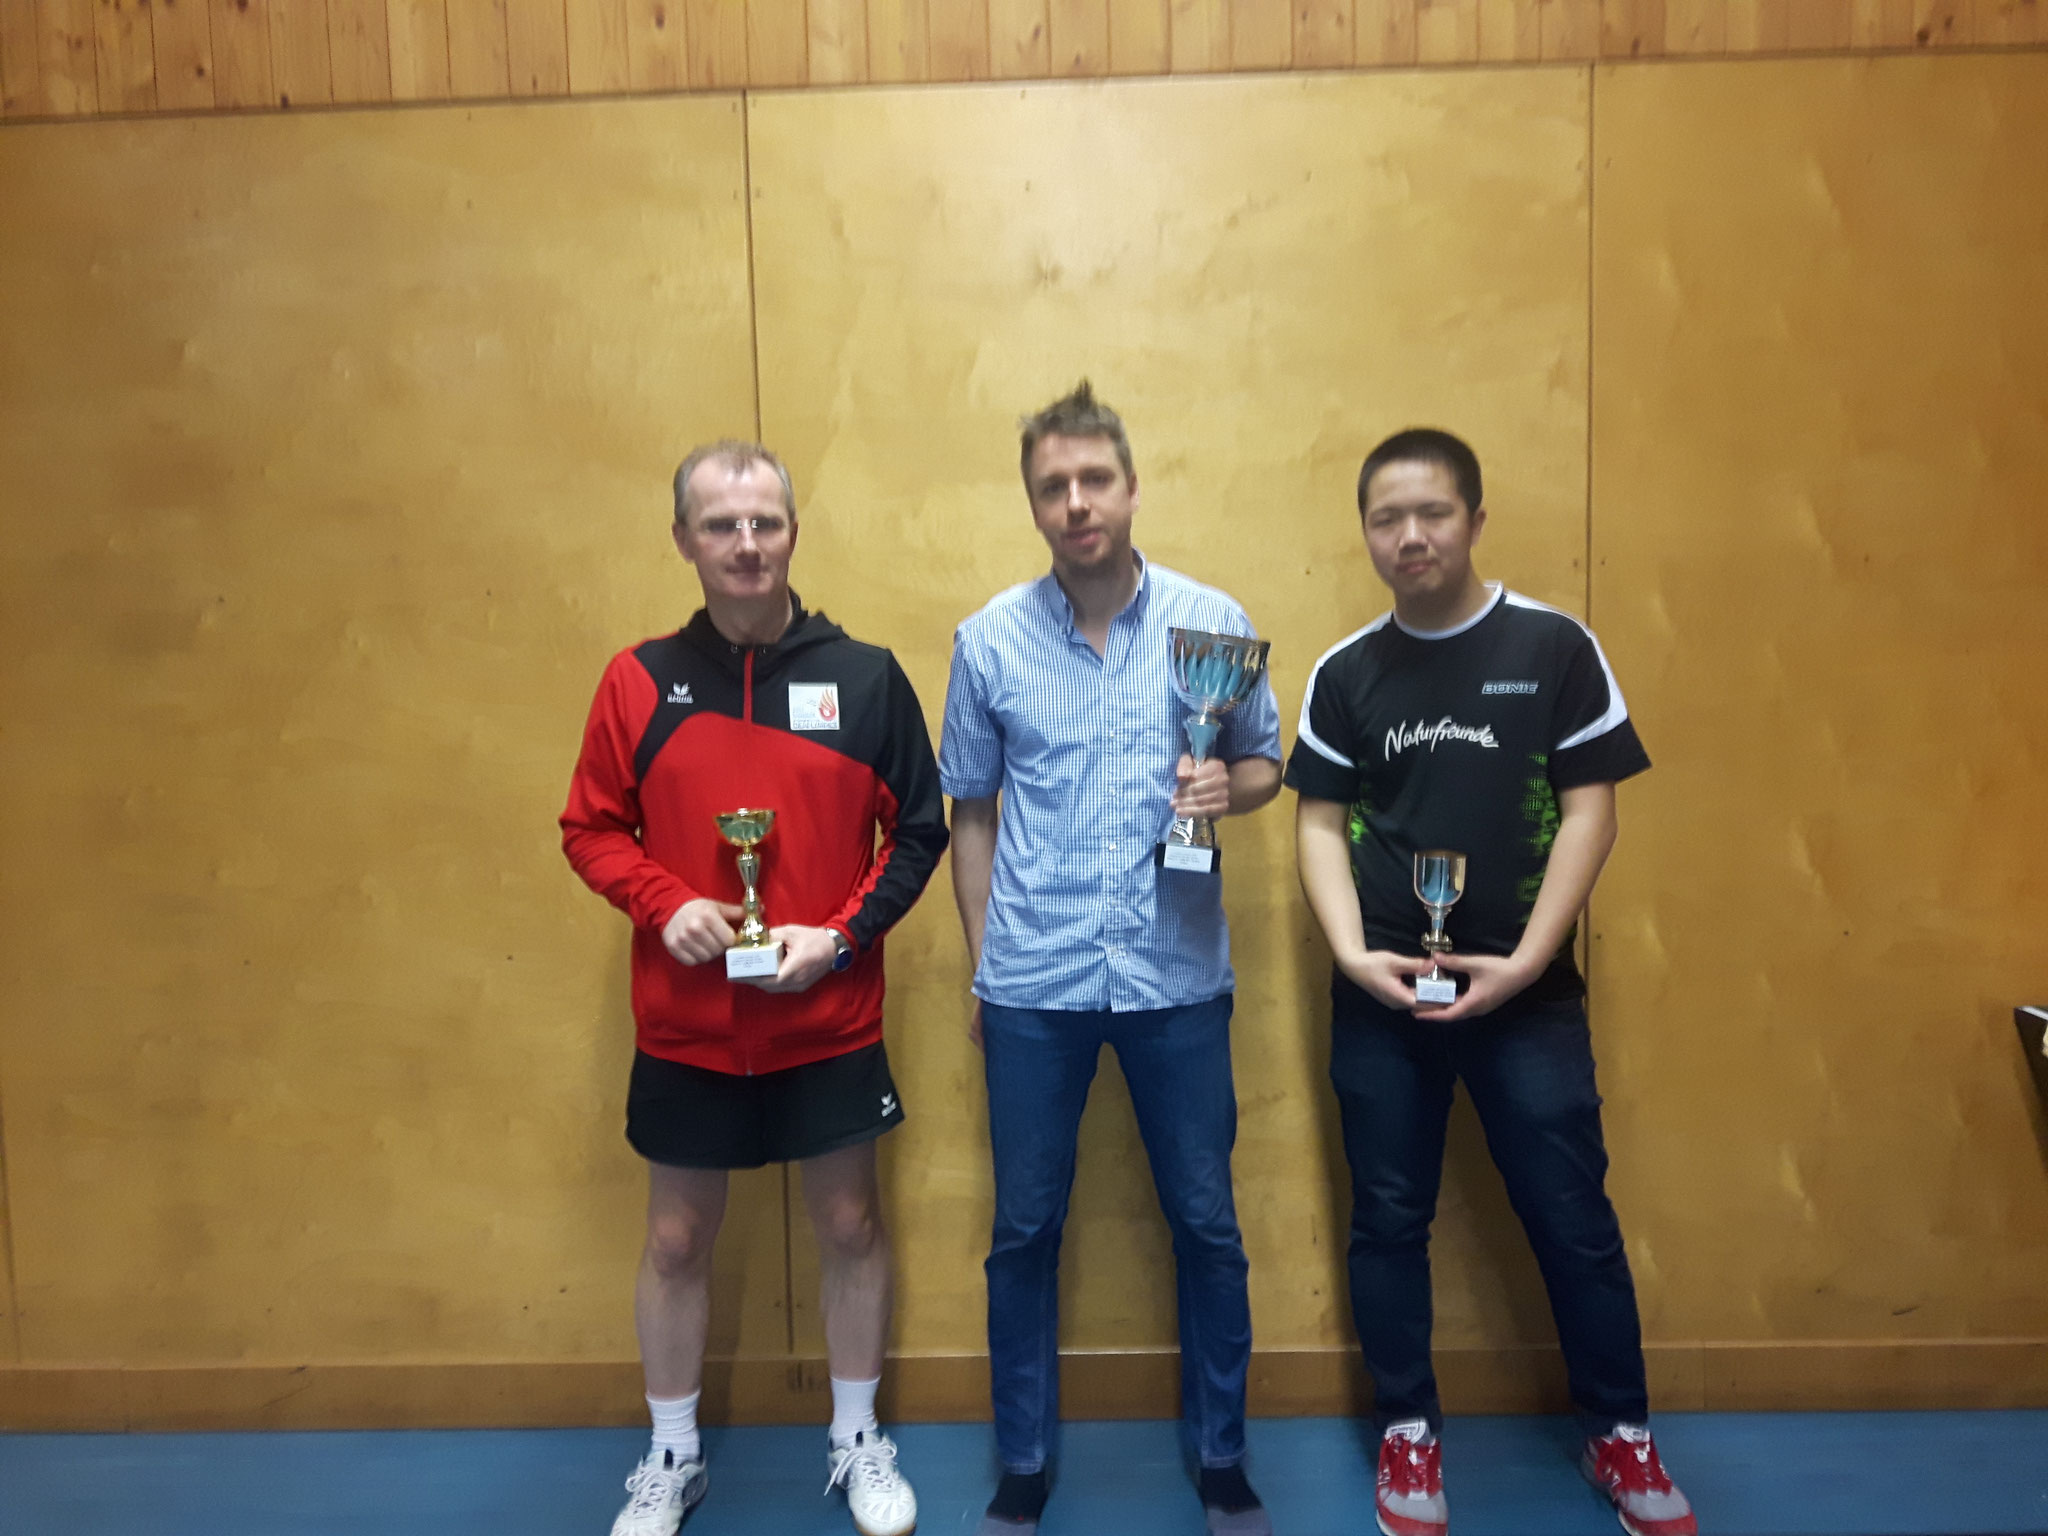 Siegerfoto Bewerb A: v.l.n.r. Erwin Stürmer (WPAE) (Platz 2), Johannes Steindl (OLY) (Sieger), Eric Tang (NFS) (Platz 3)